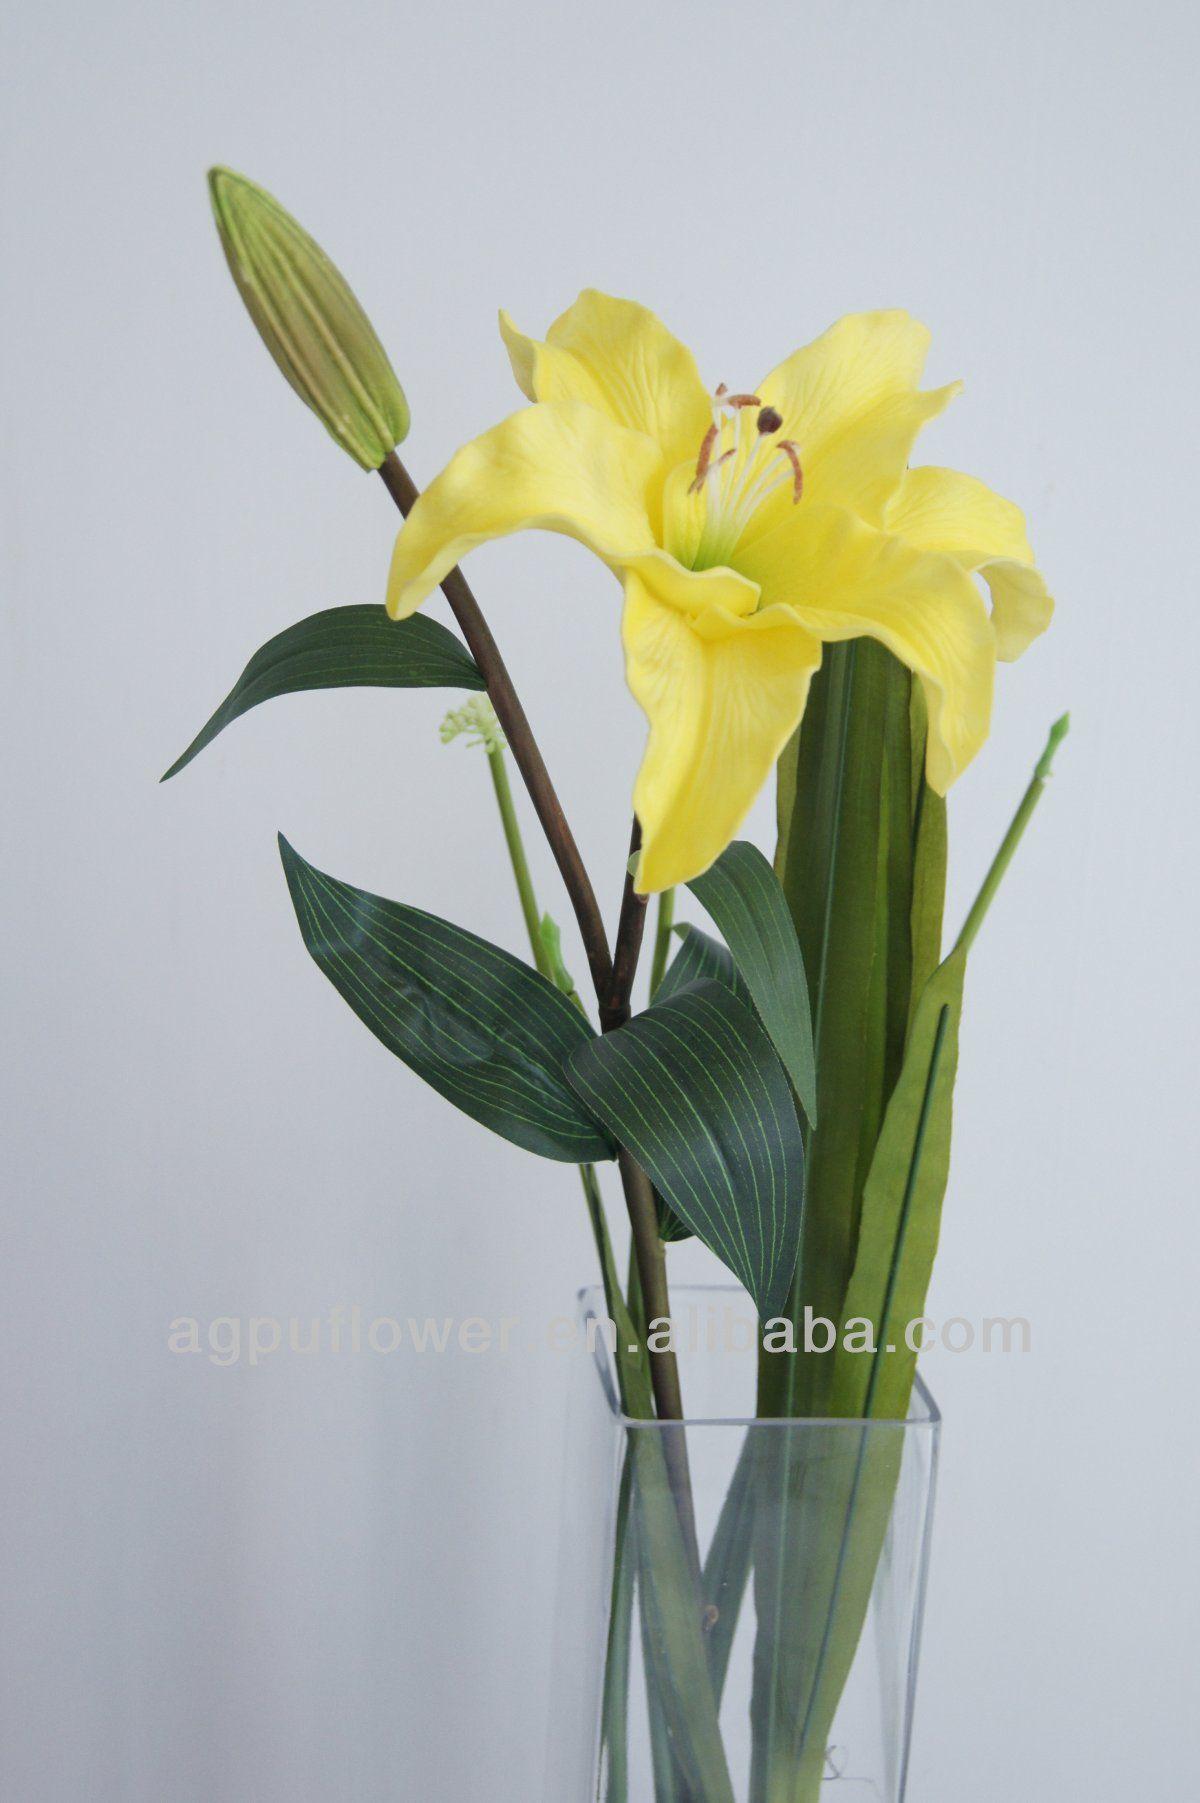 Decorative pu artificial tiger lily flower supplier china decorative pu artificial tiger lily flower supplier izmirmasajfo